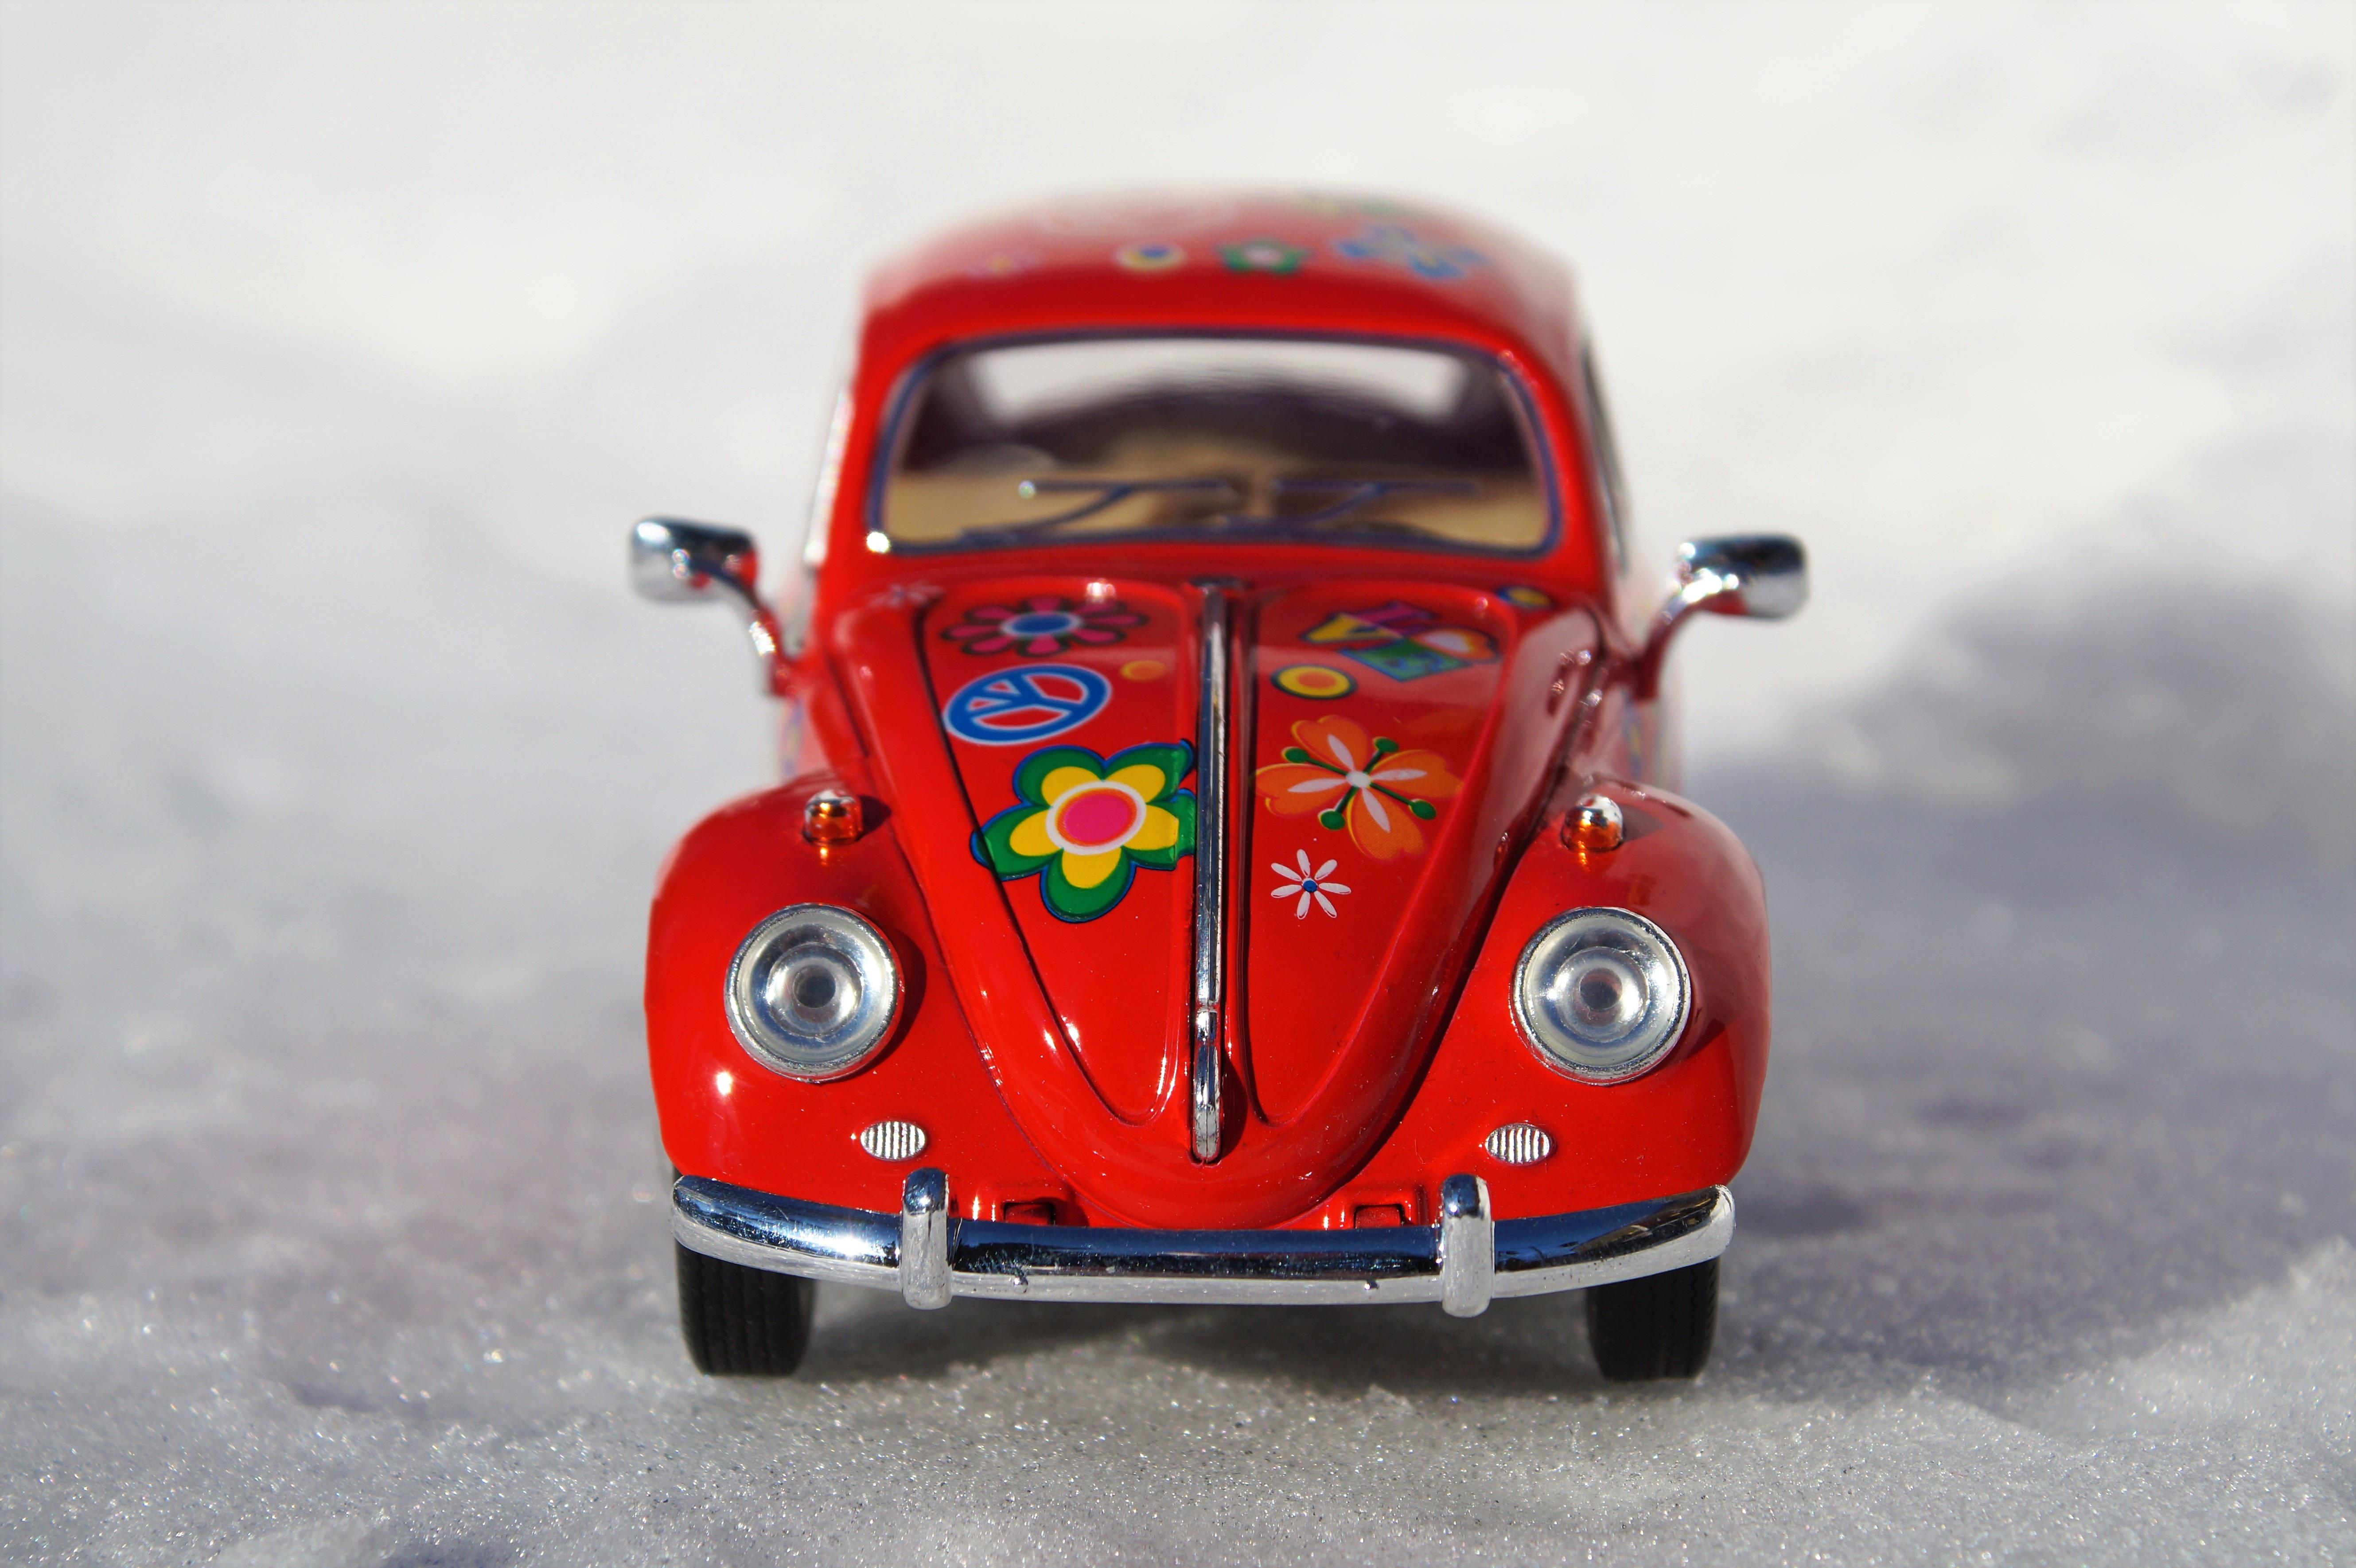 Free Images : vw, old, red, auto, vintage car, oldtimer, dare ...